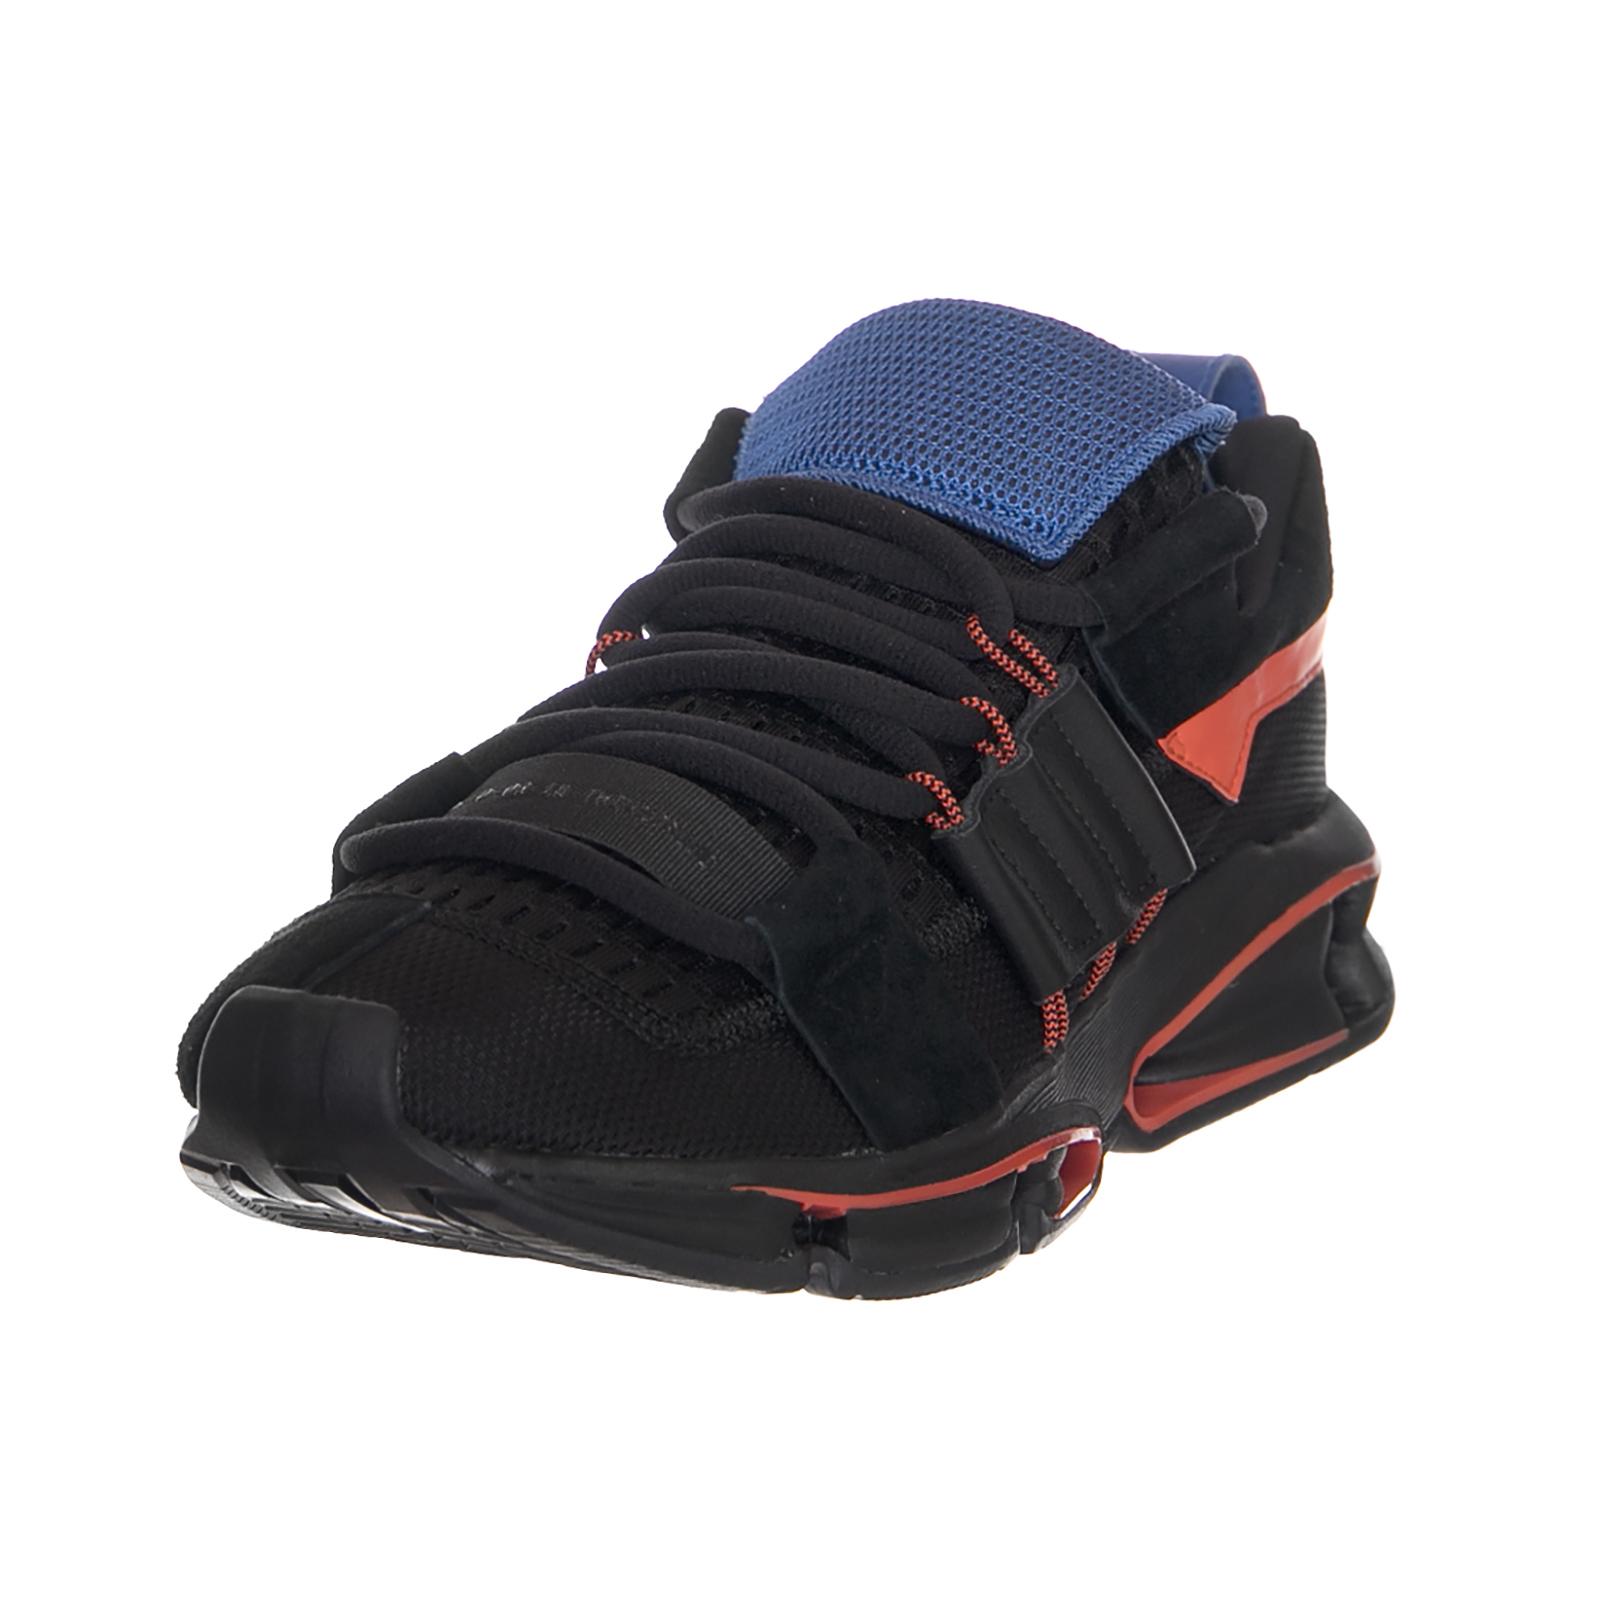 Details zu Adidas Turnschuhe Twinstrike Adv Black Blau Red Schwarz